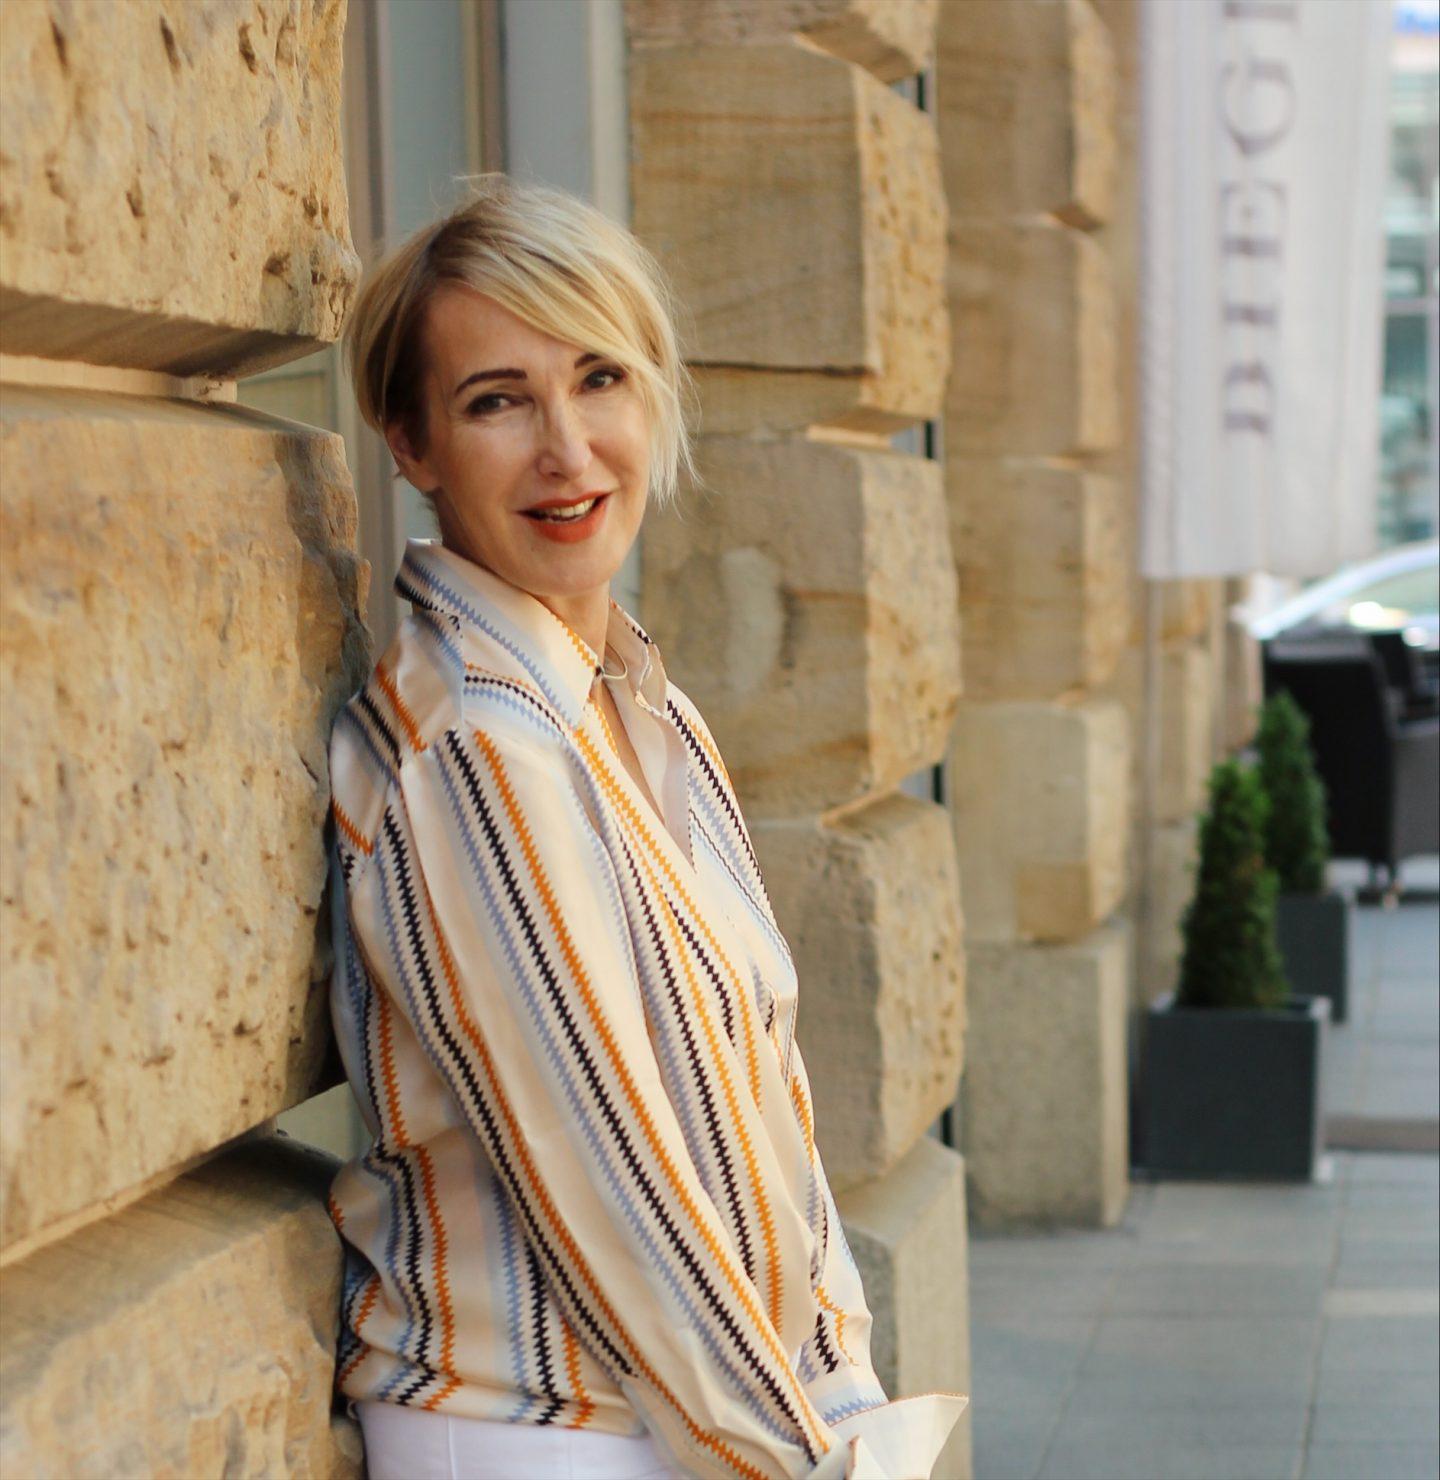 Augenbrauen Permanent Make-up – Erfahrungstest